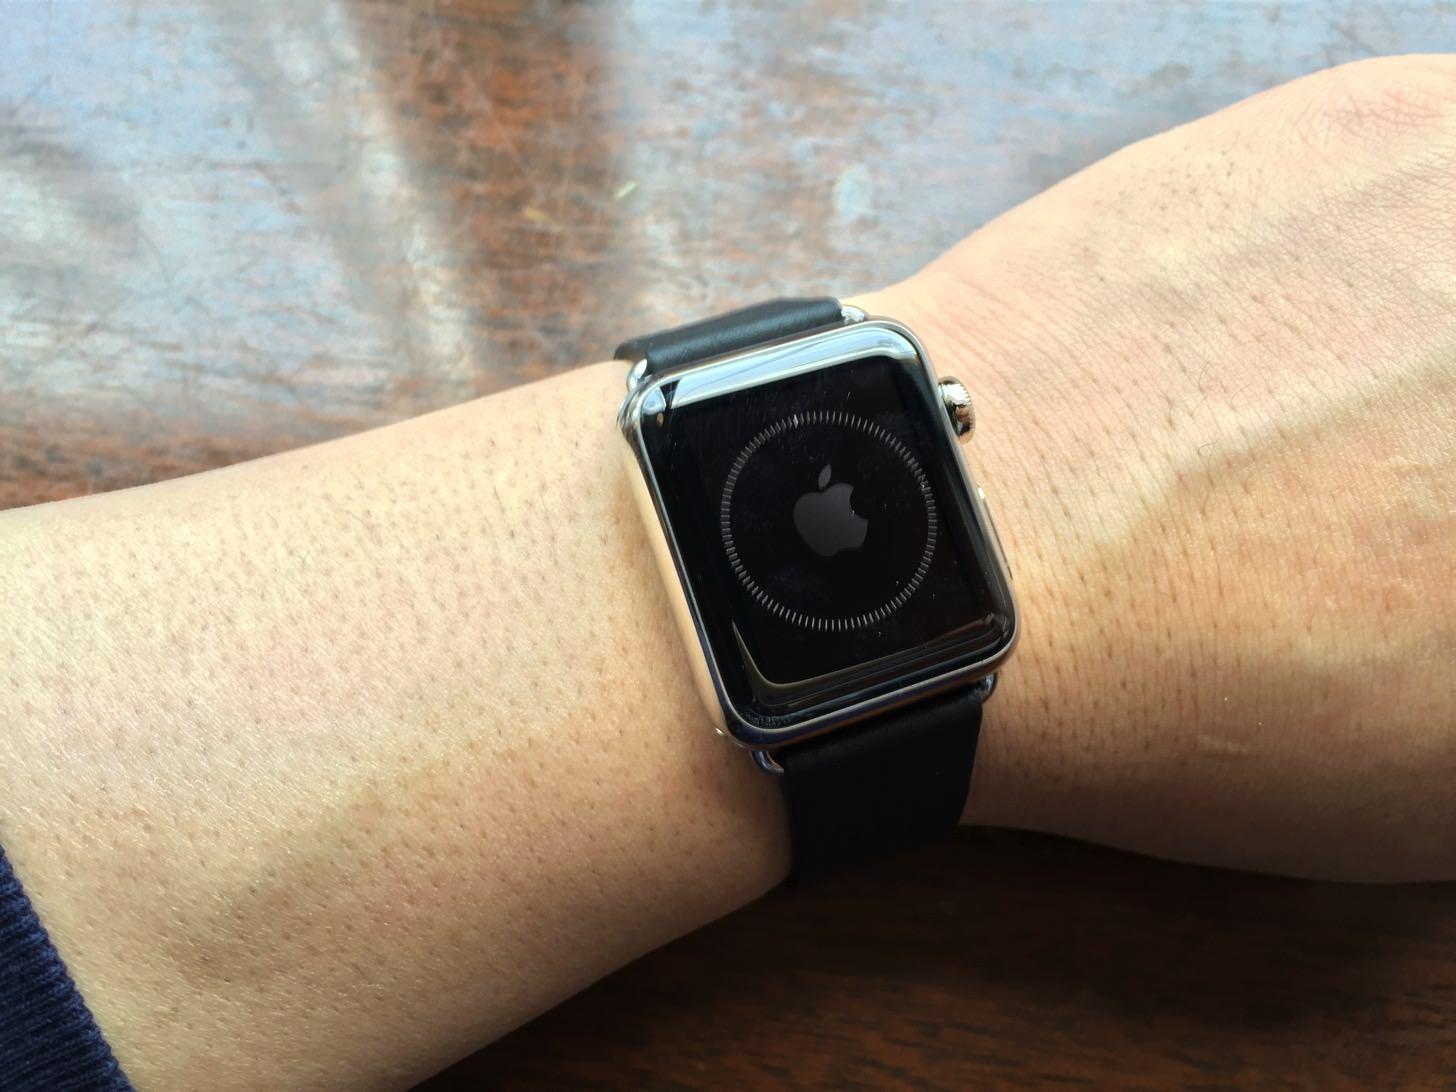 iPhoneとApple Watchが同期中。